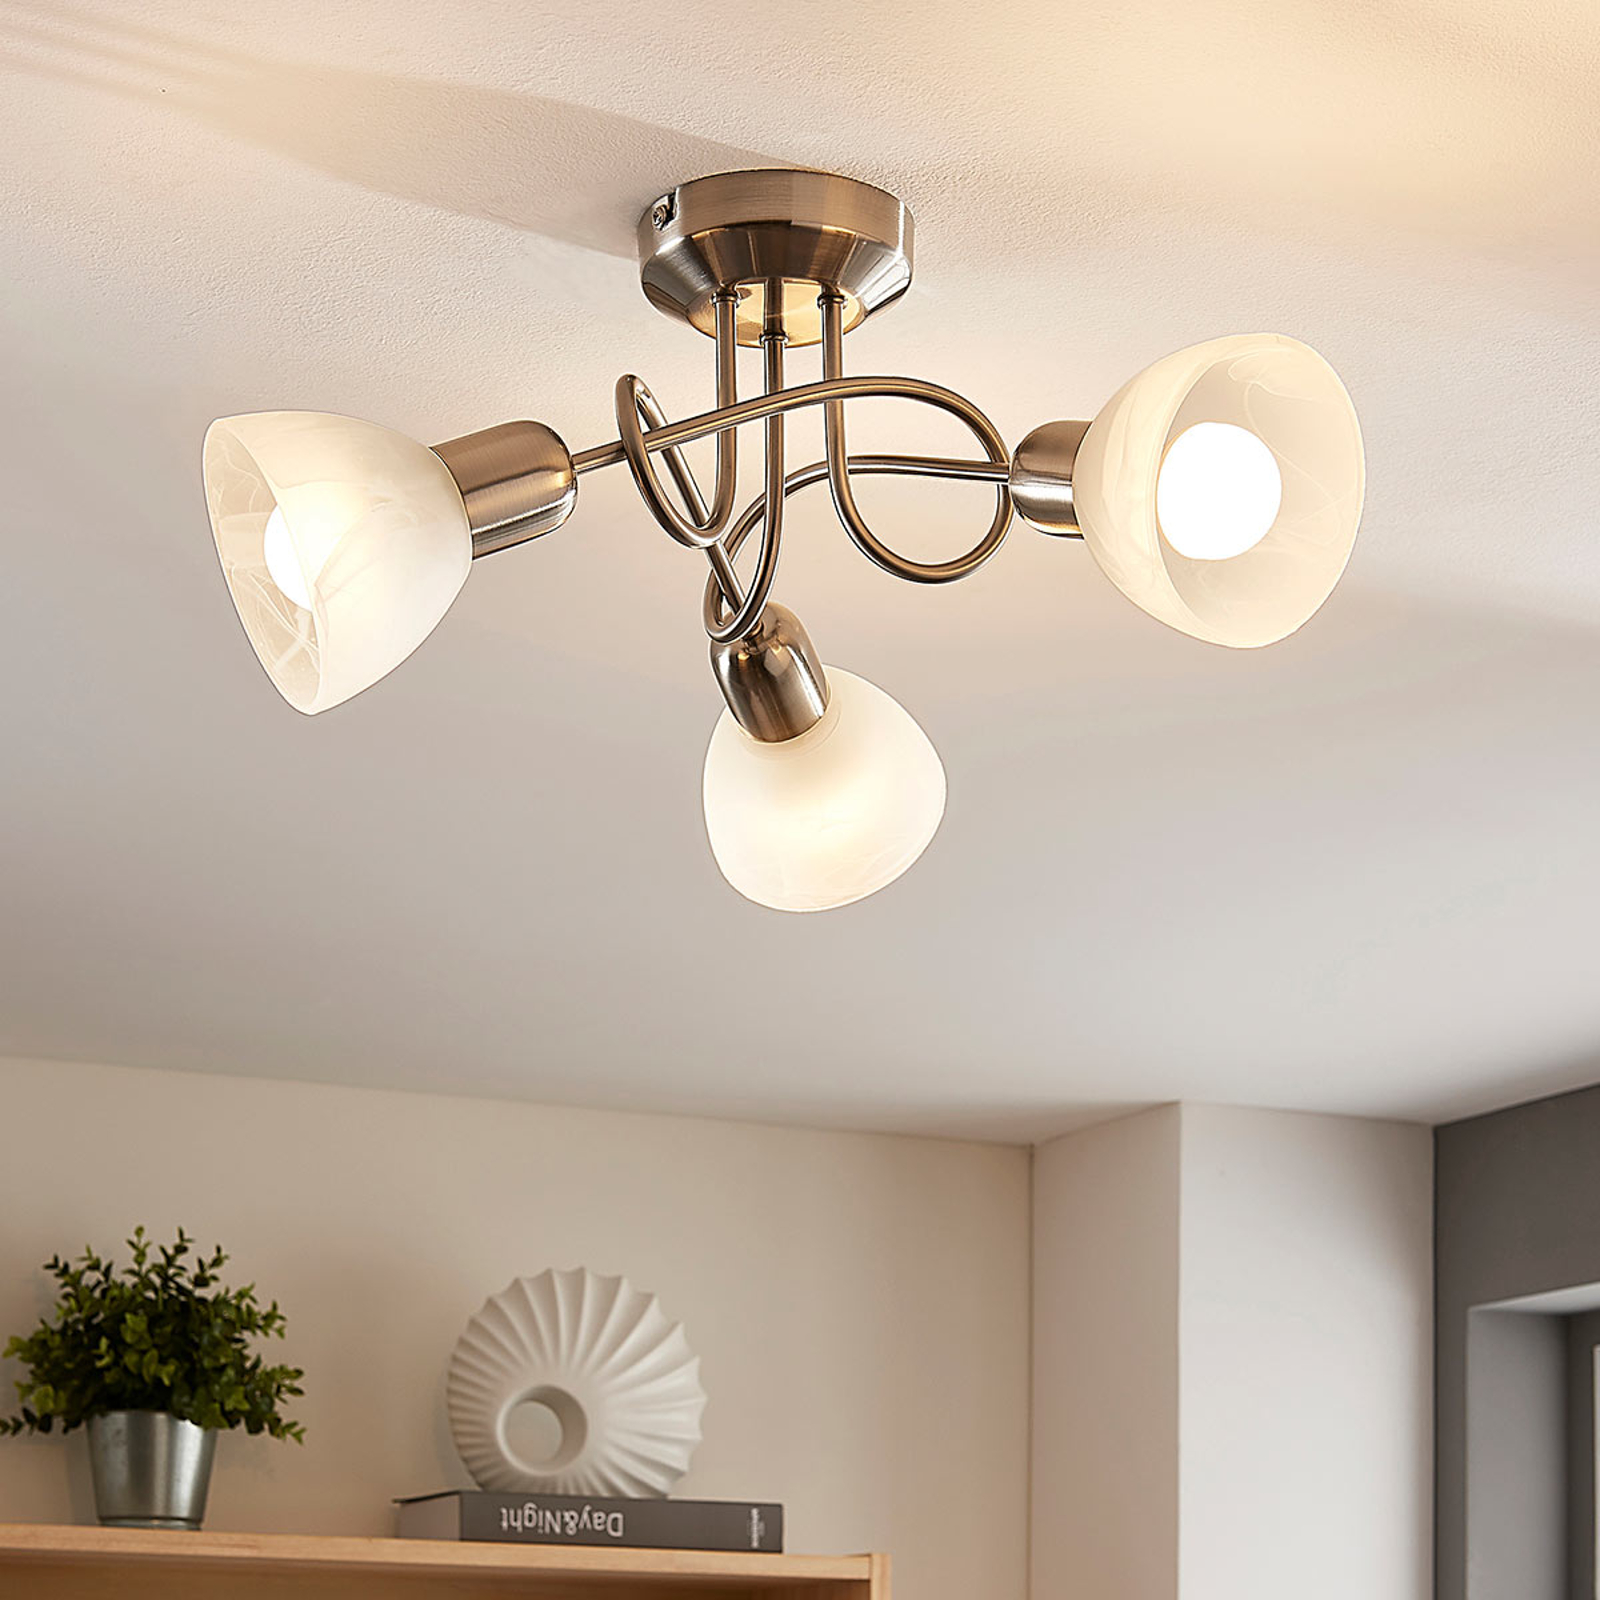 Lindby Paulina LED-Deckenlampe, 3-fl., rund